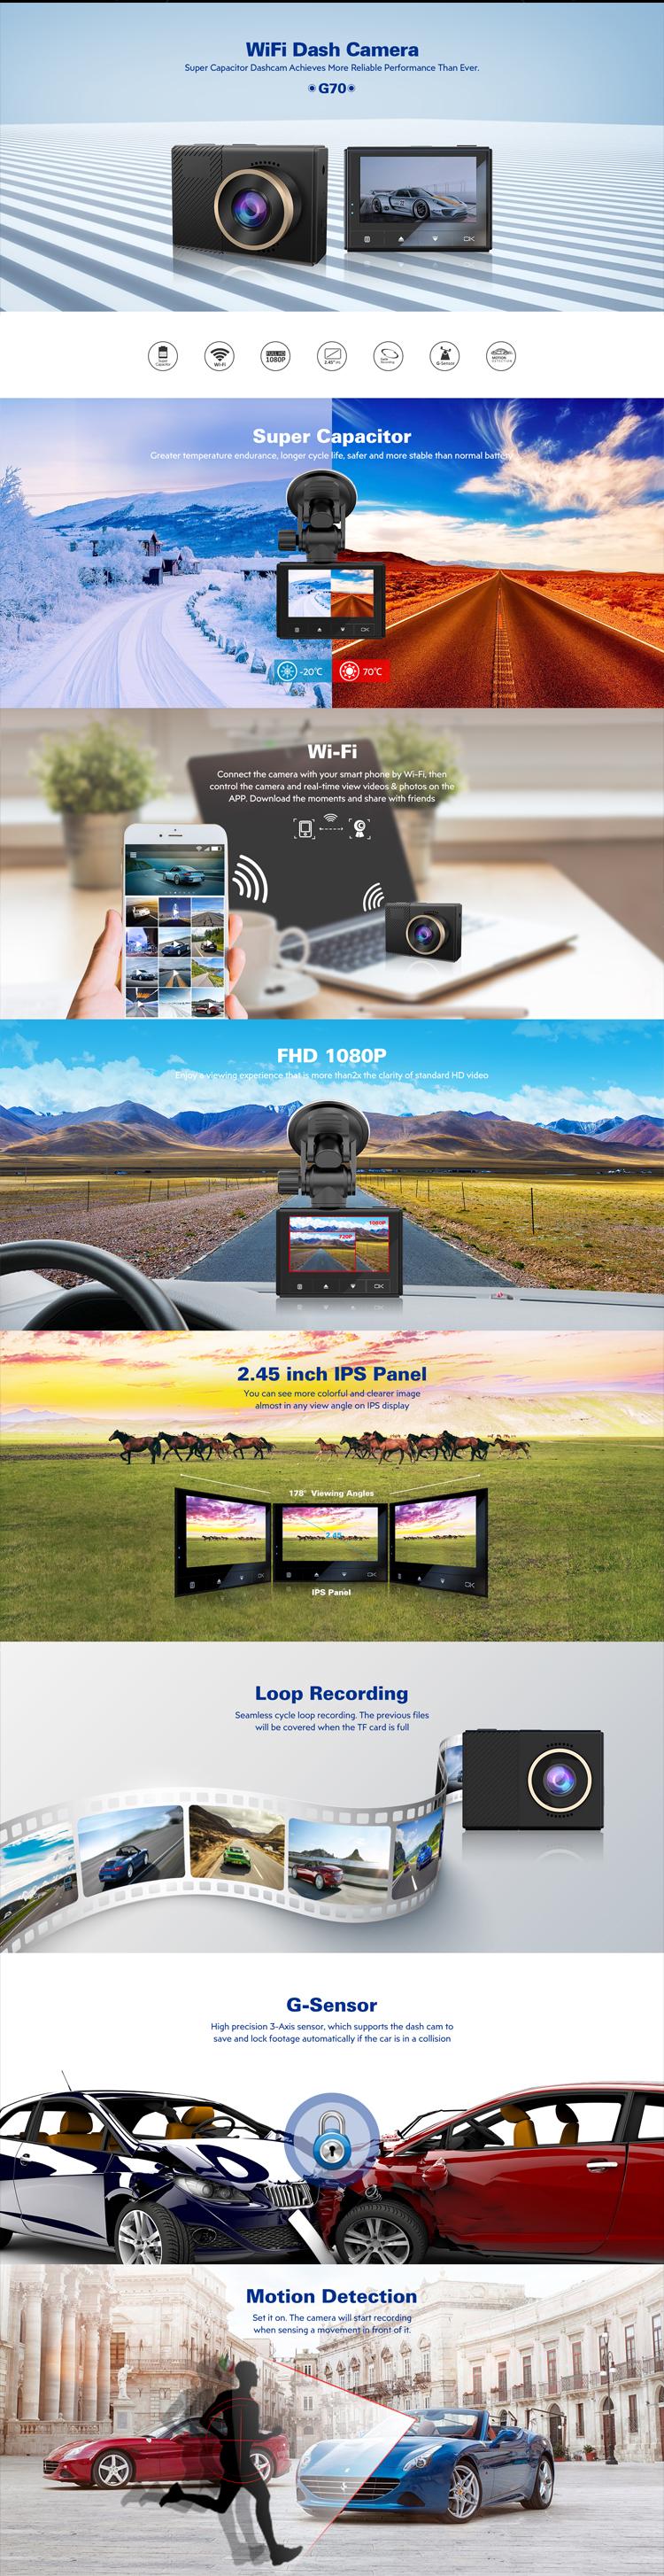 Dash cam G-sensor Good night vision  WIFI Super capacitor